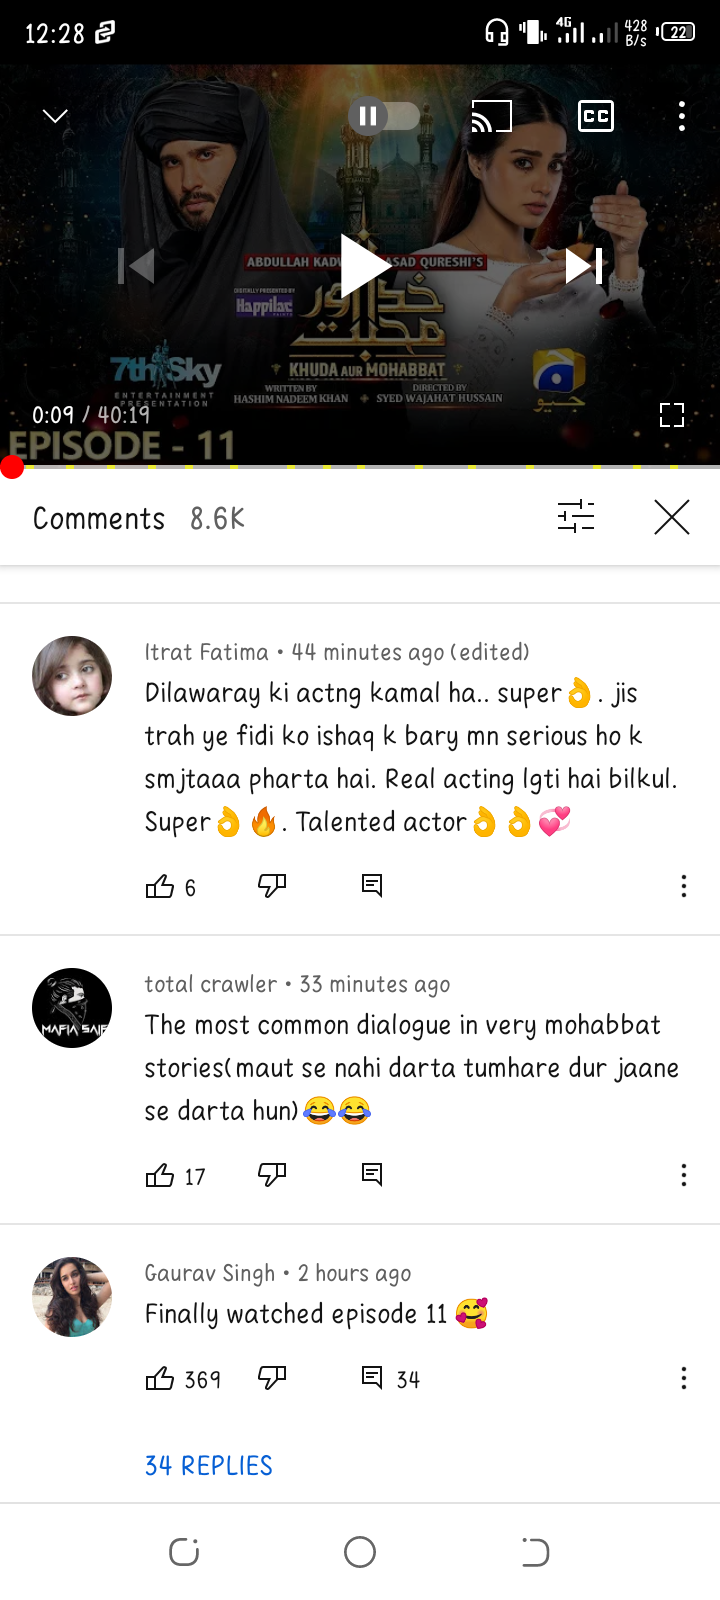 Public Opinion on Khuda Aur Mohabbat 3 Episode 11